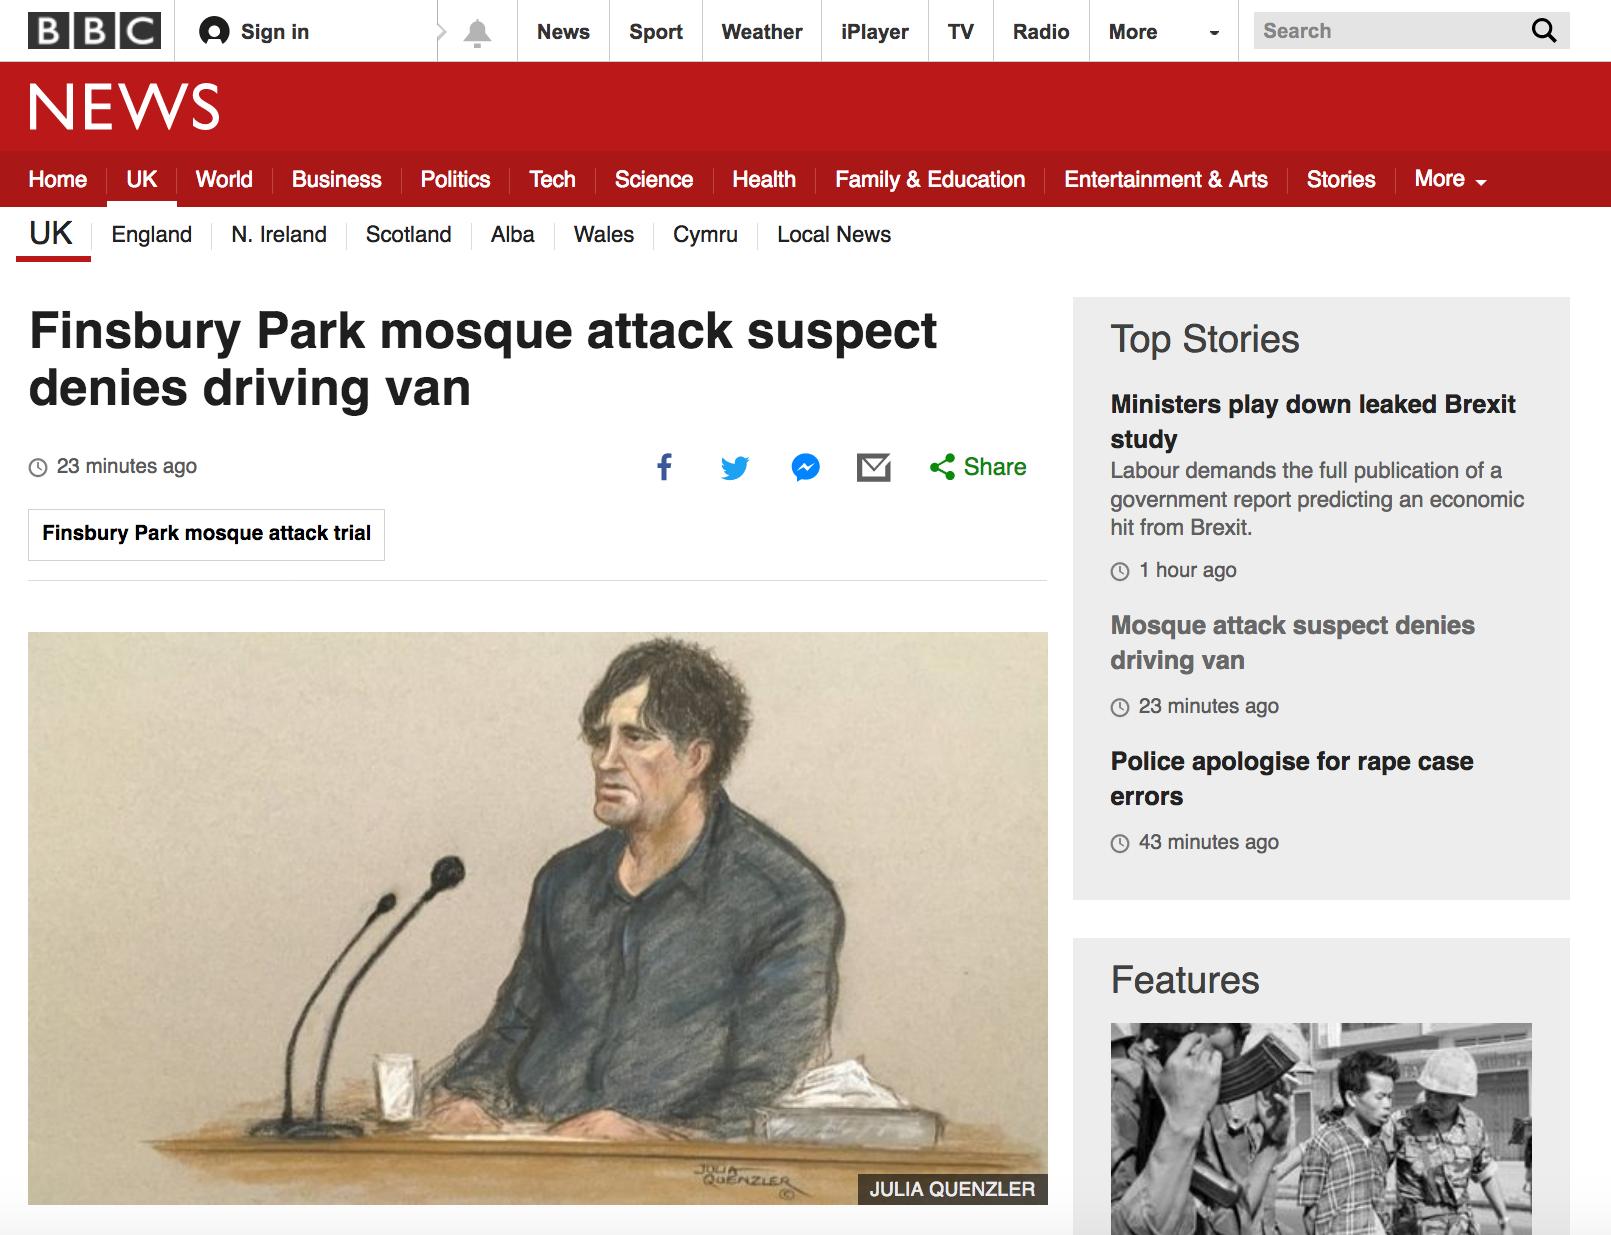 BBC Headline - Man Denies Driving Van